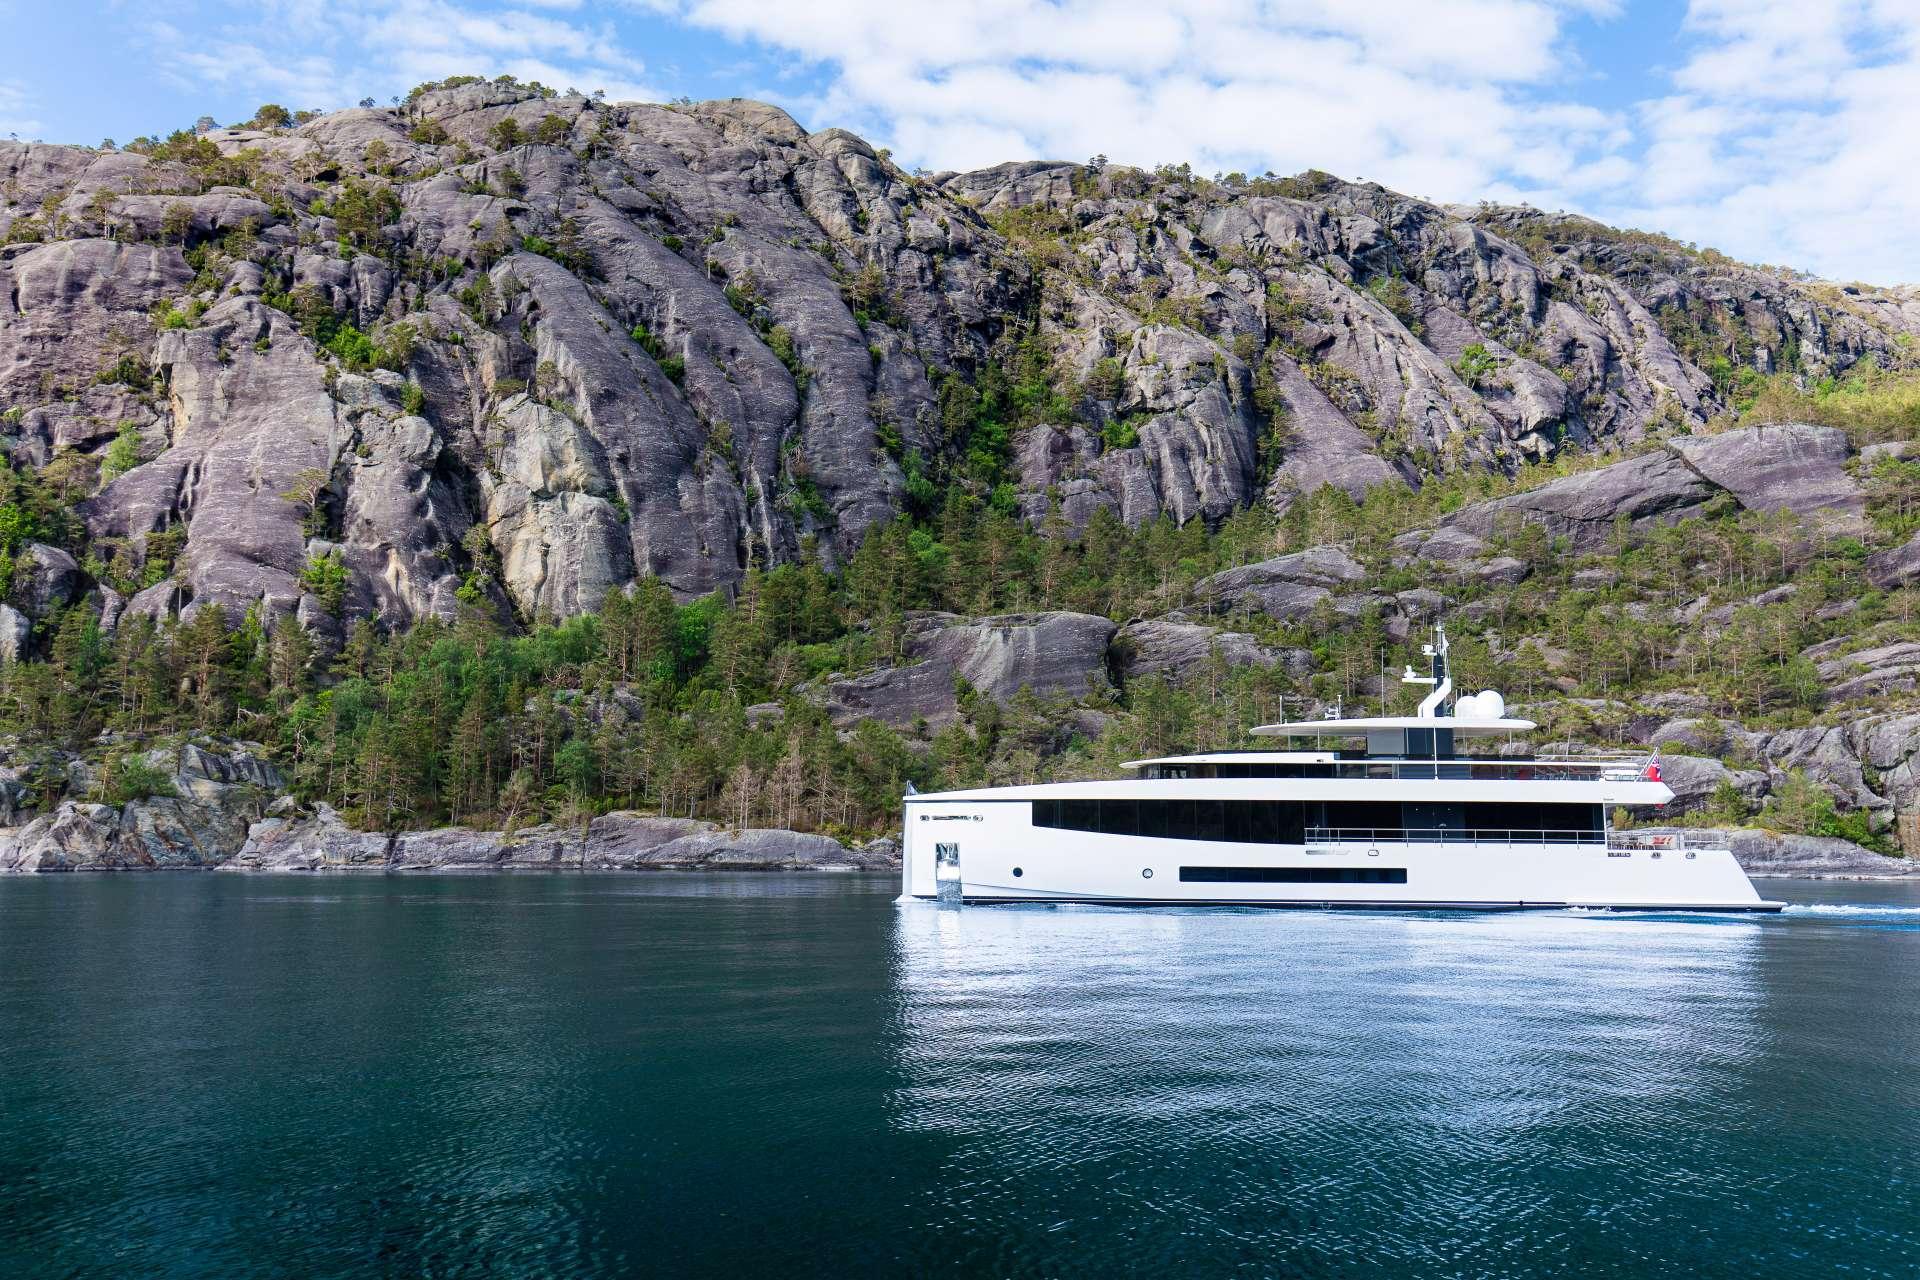 Alquiler de yates en Noruega. Yates de alquiler en Noruega. Barcos baratos de alquiler en Noruega